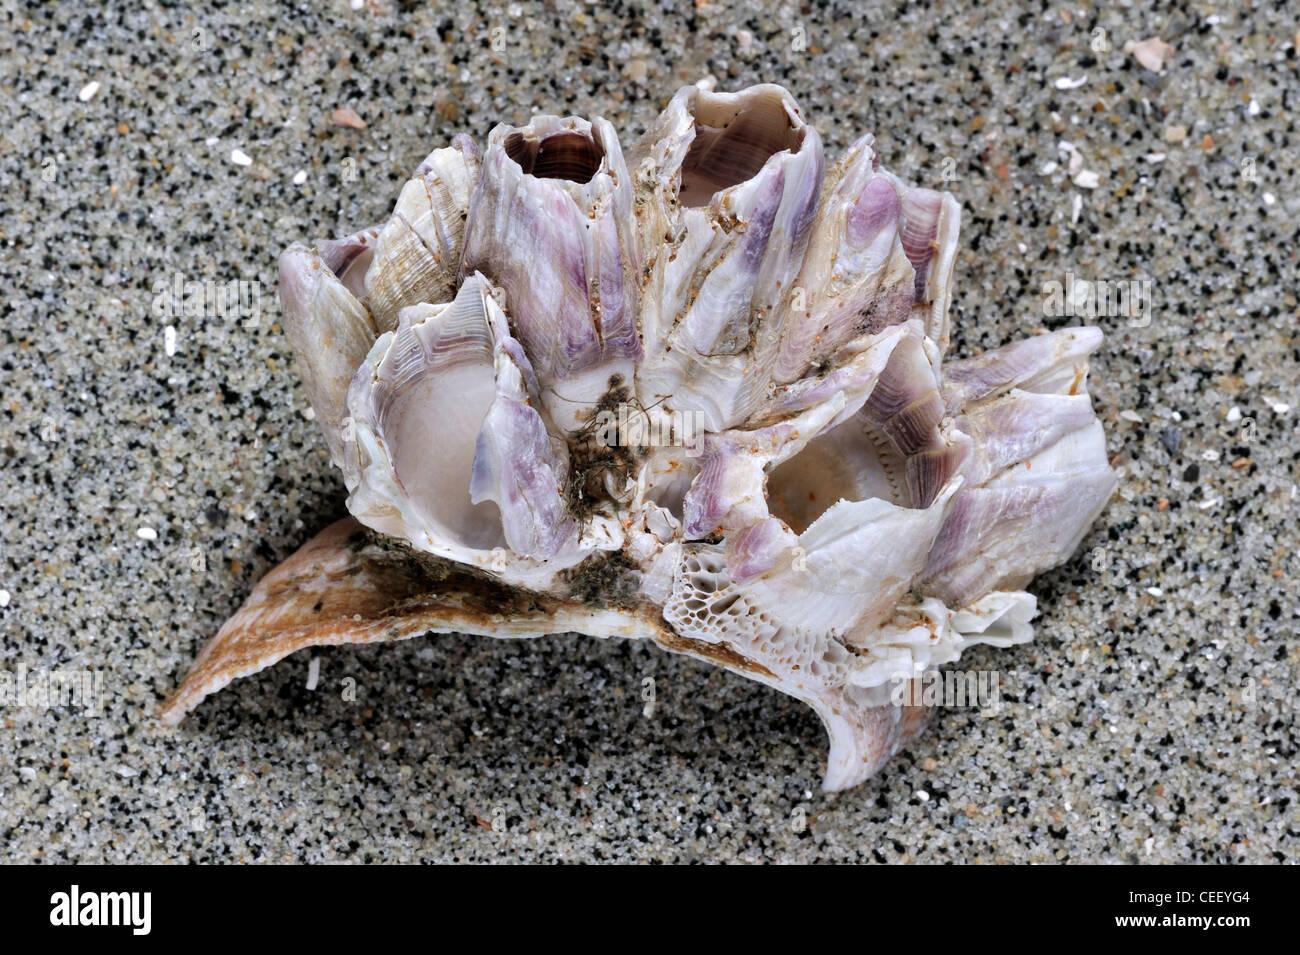 American slipper limpet (Crepidula fornicata) shell on beach with Acorn barnacles (Megabalanus tintinnabulum) growing on it Stock Photo